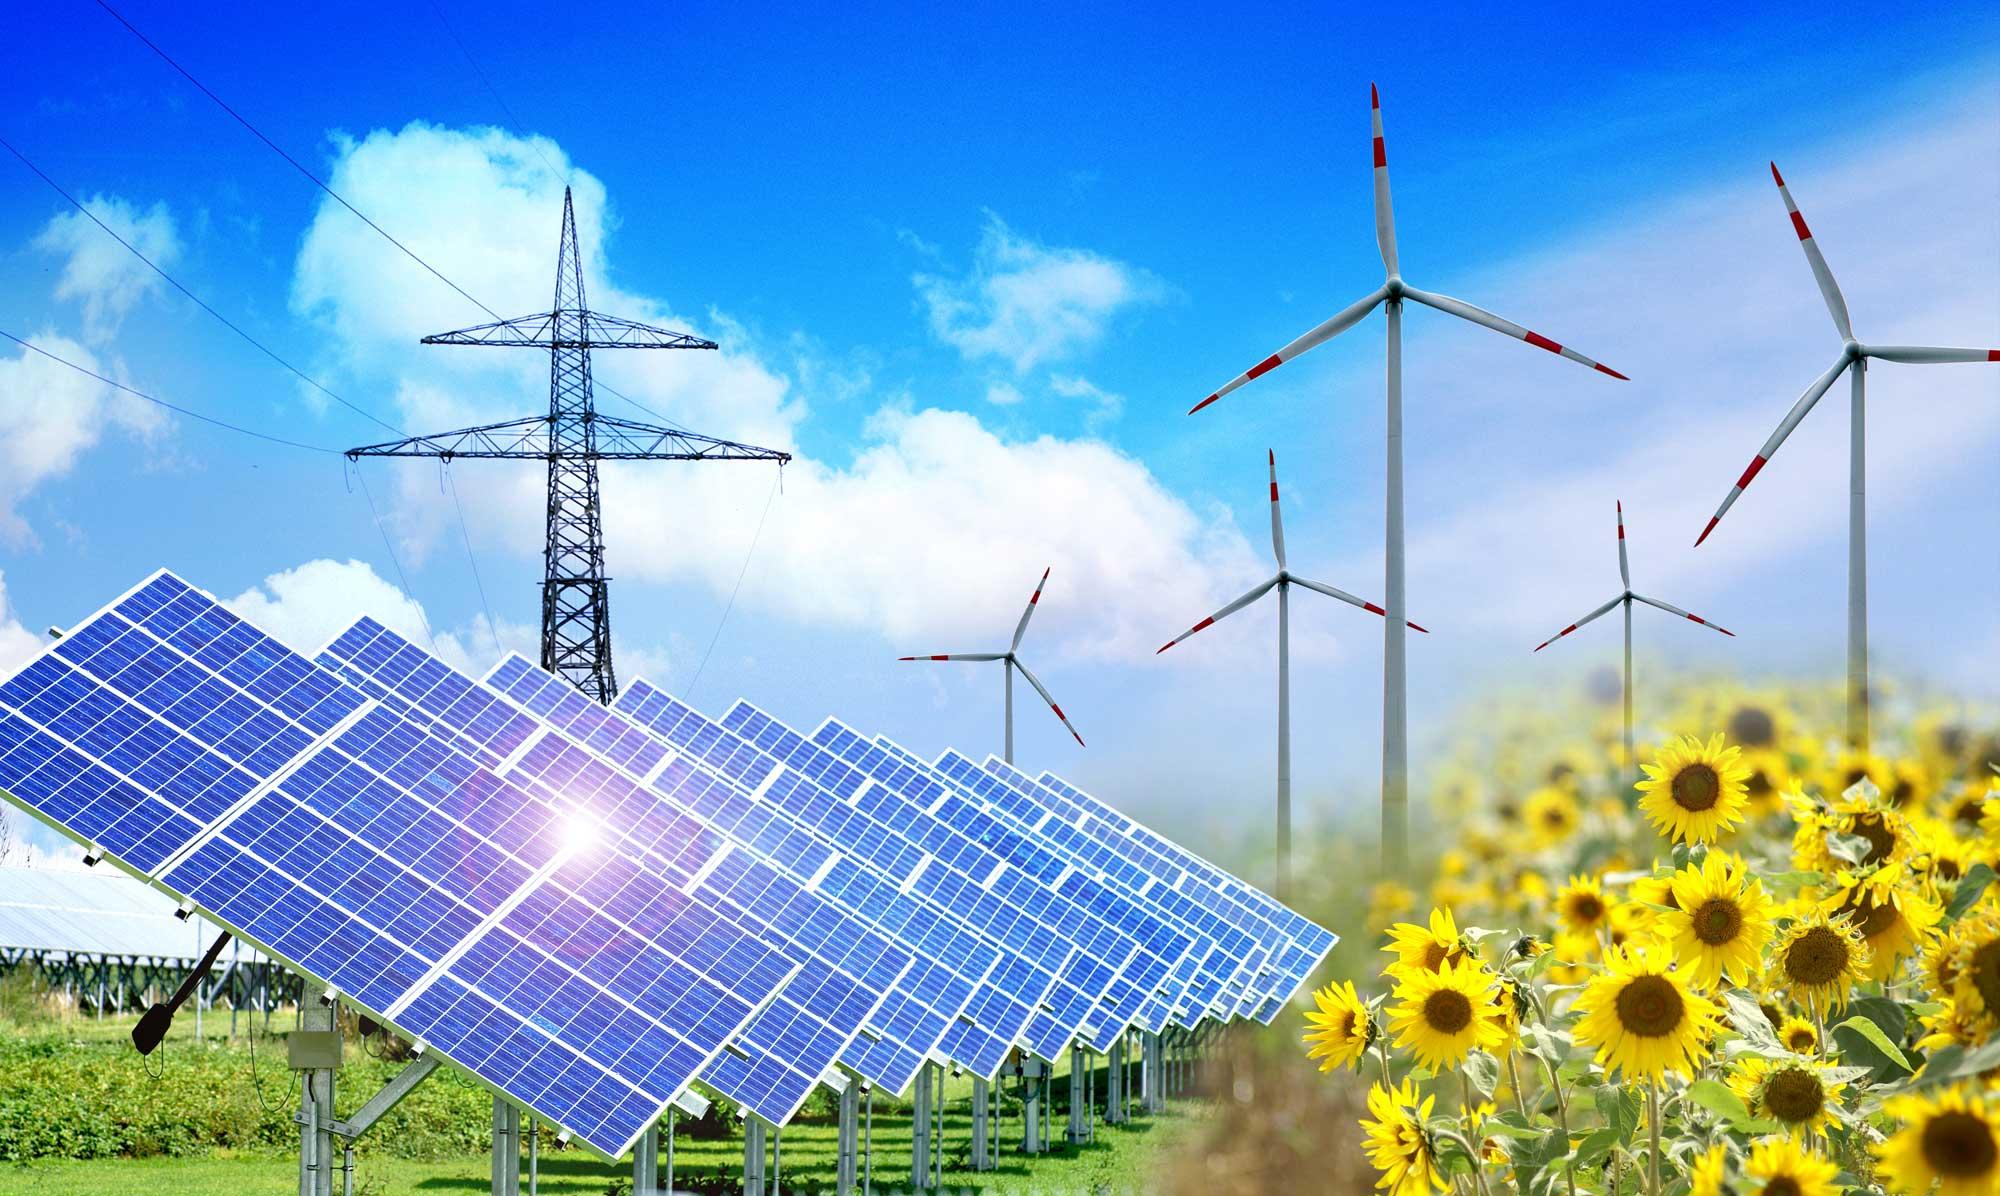 Energia din surse regenerabile va imbunatati planeta noastra